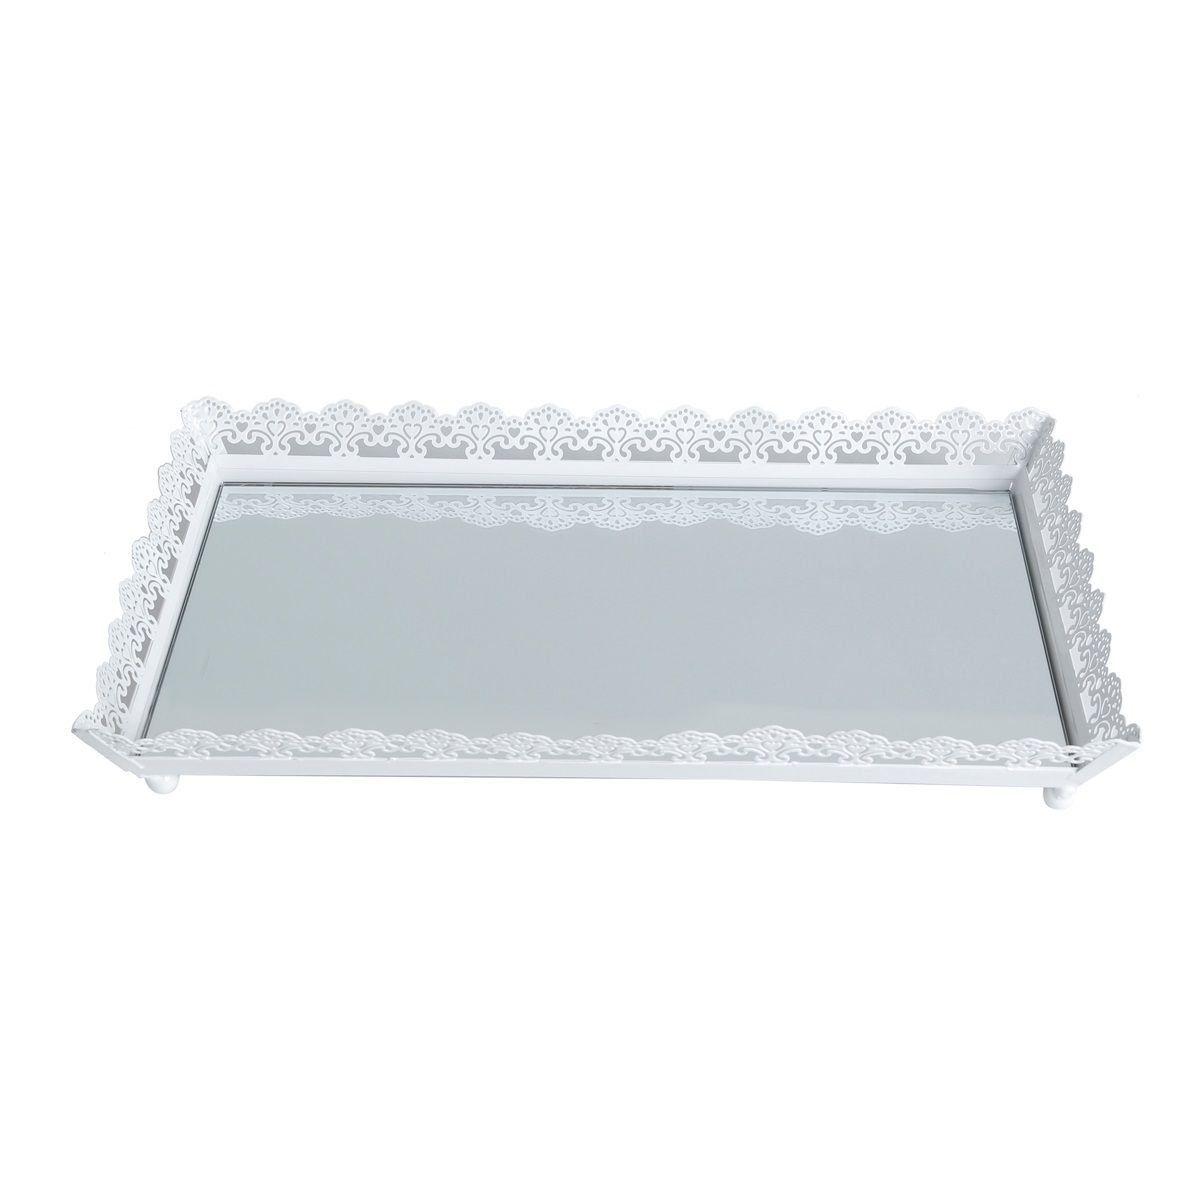 Bandeja, Suporte 30 cm de ferro esmaltado branco com espelho Bon Gourmet - 4769